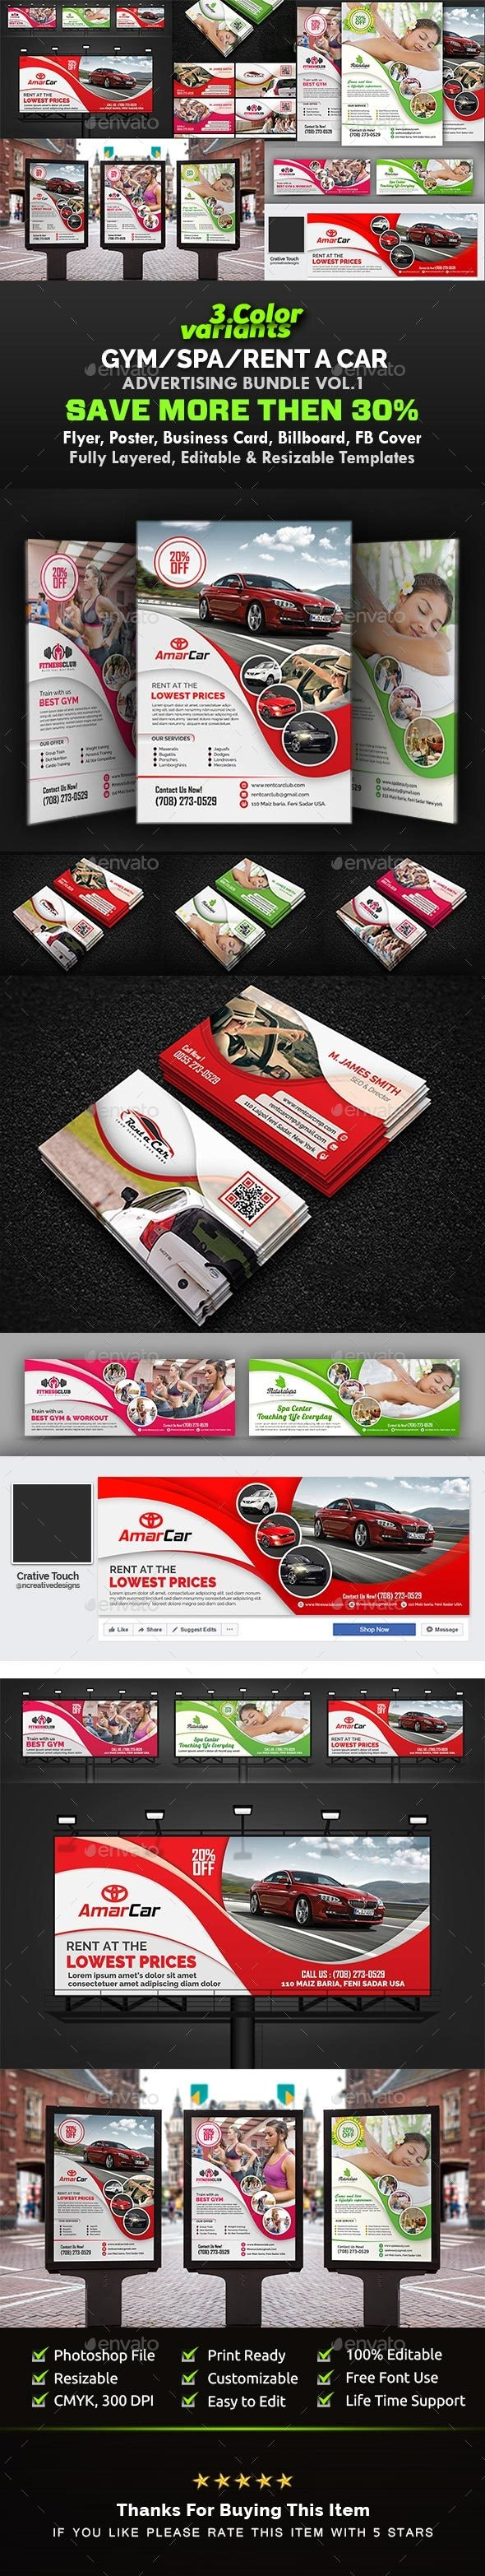 Gym Ad Bundle | Spa Ad Bundle I Car Advertising Bundle Vol.1 - Signage Print Templates